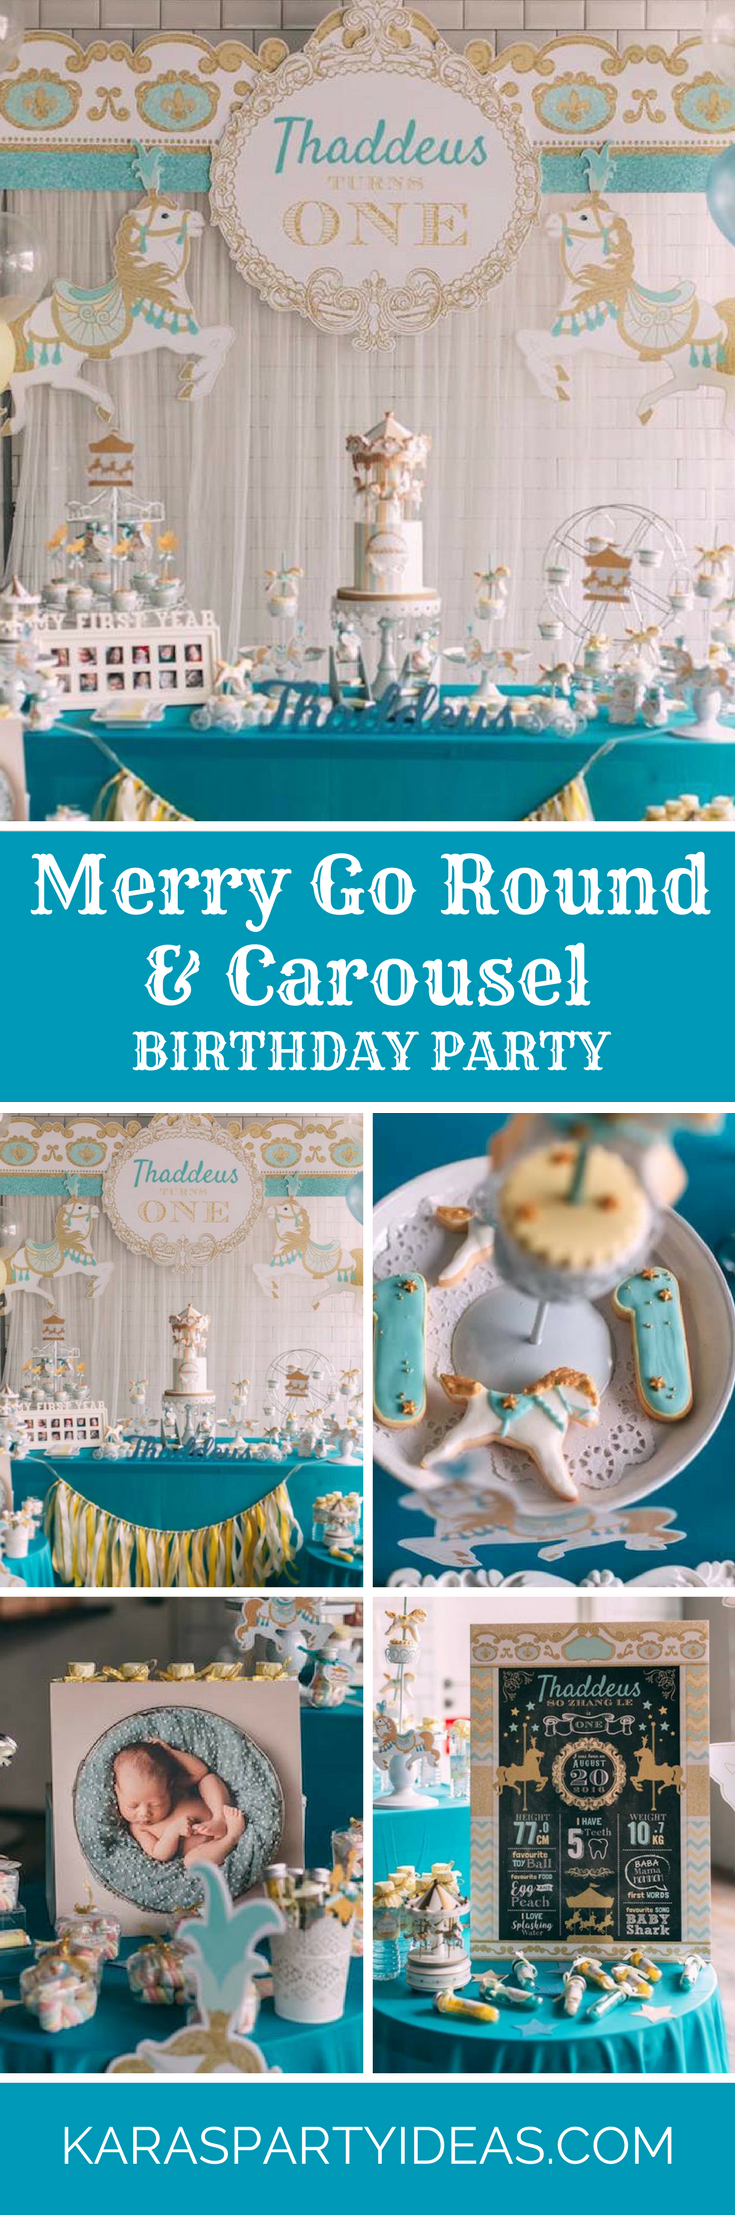 Merry Go Round and Carousel Birthday Party via Kara's Party Ideas - KarasPartyIdeas.com